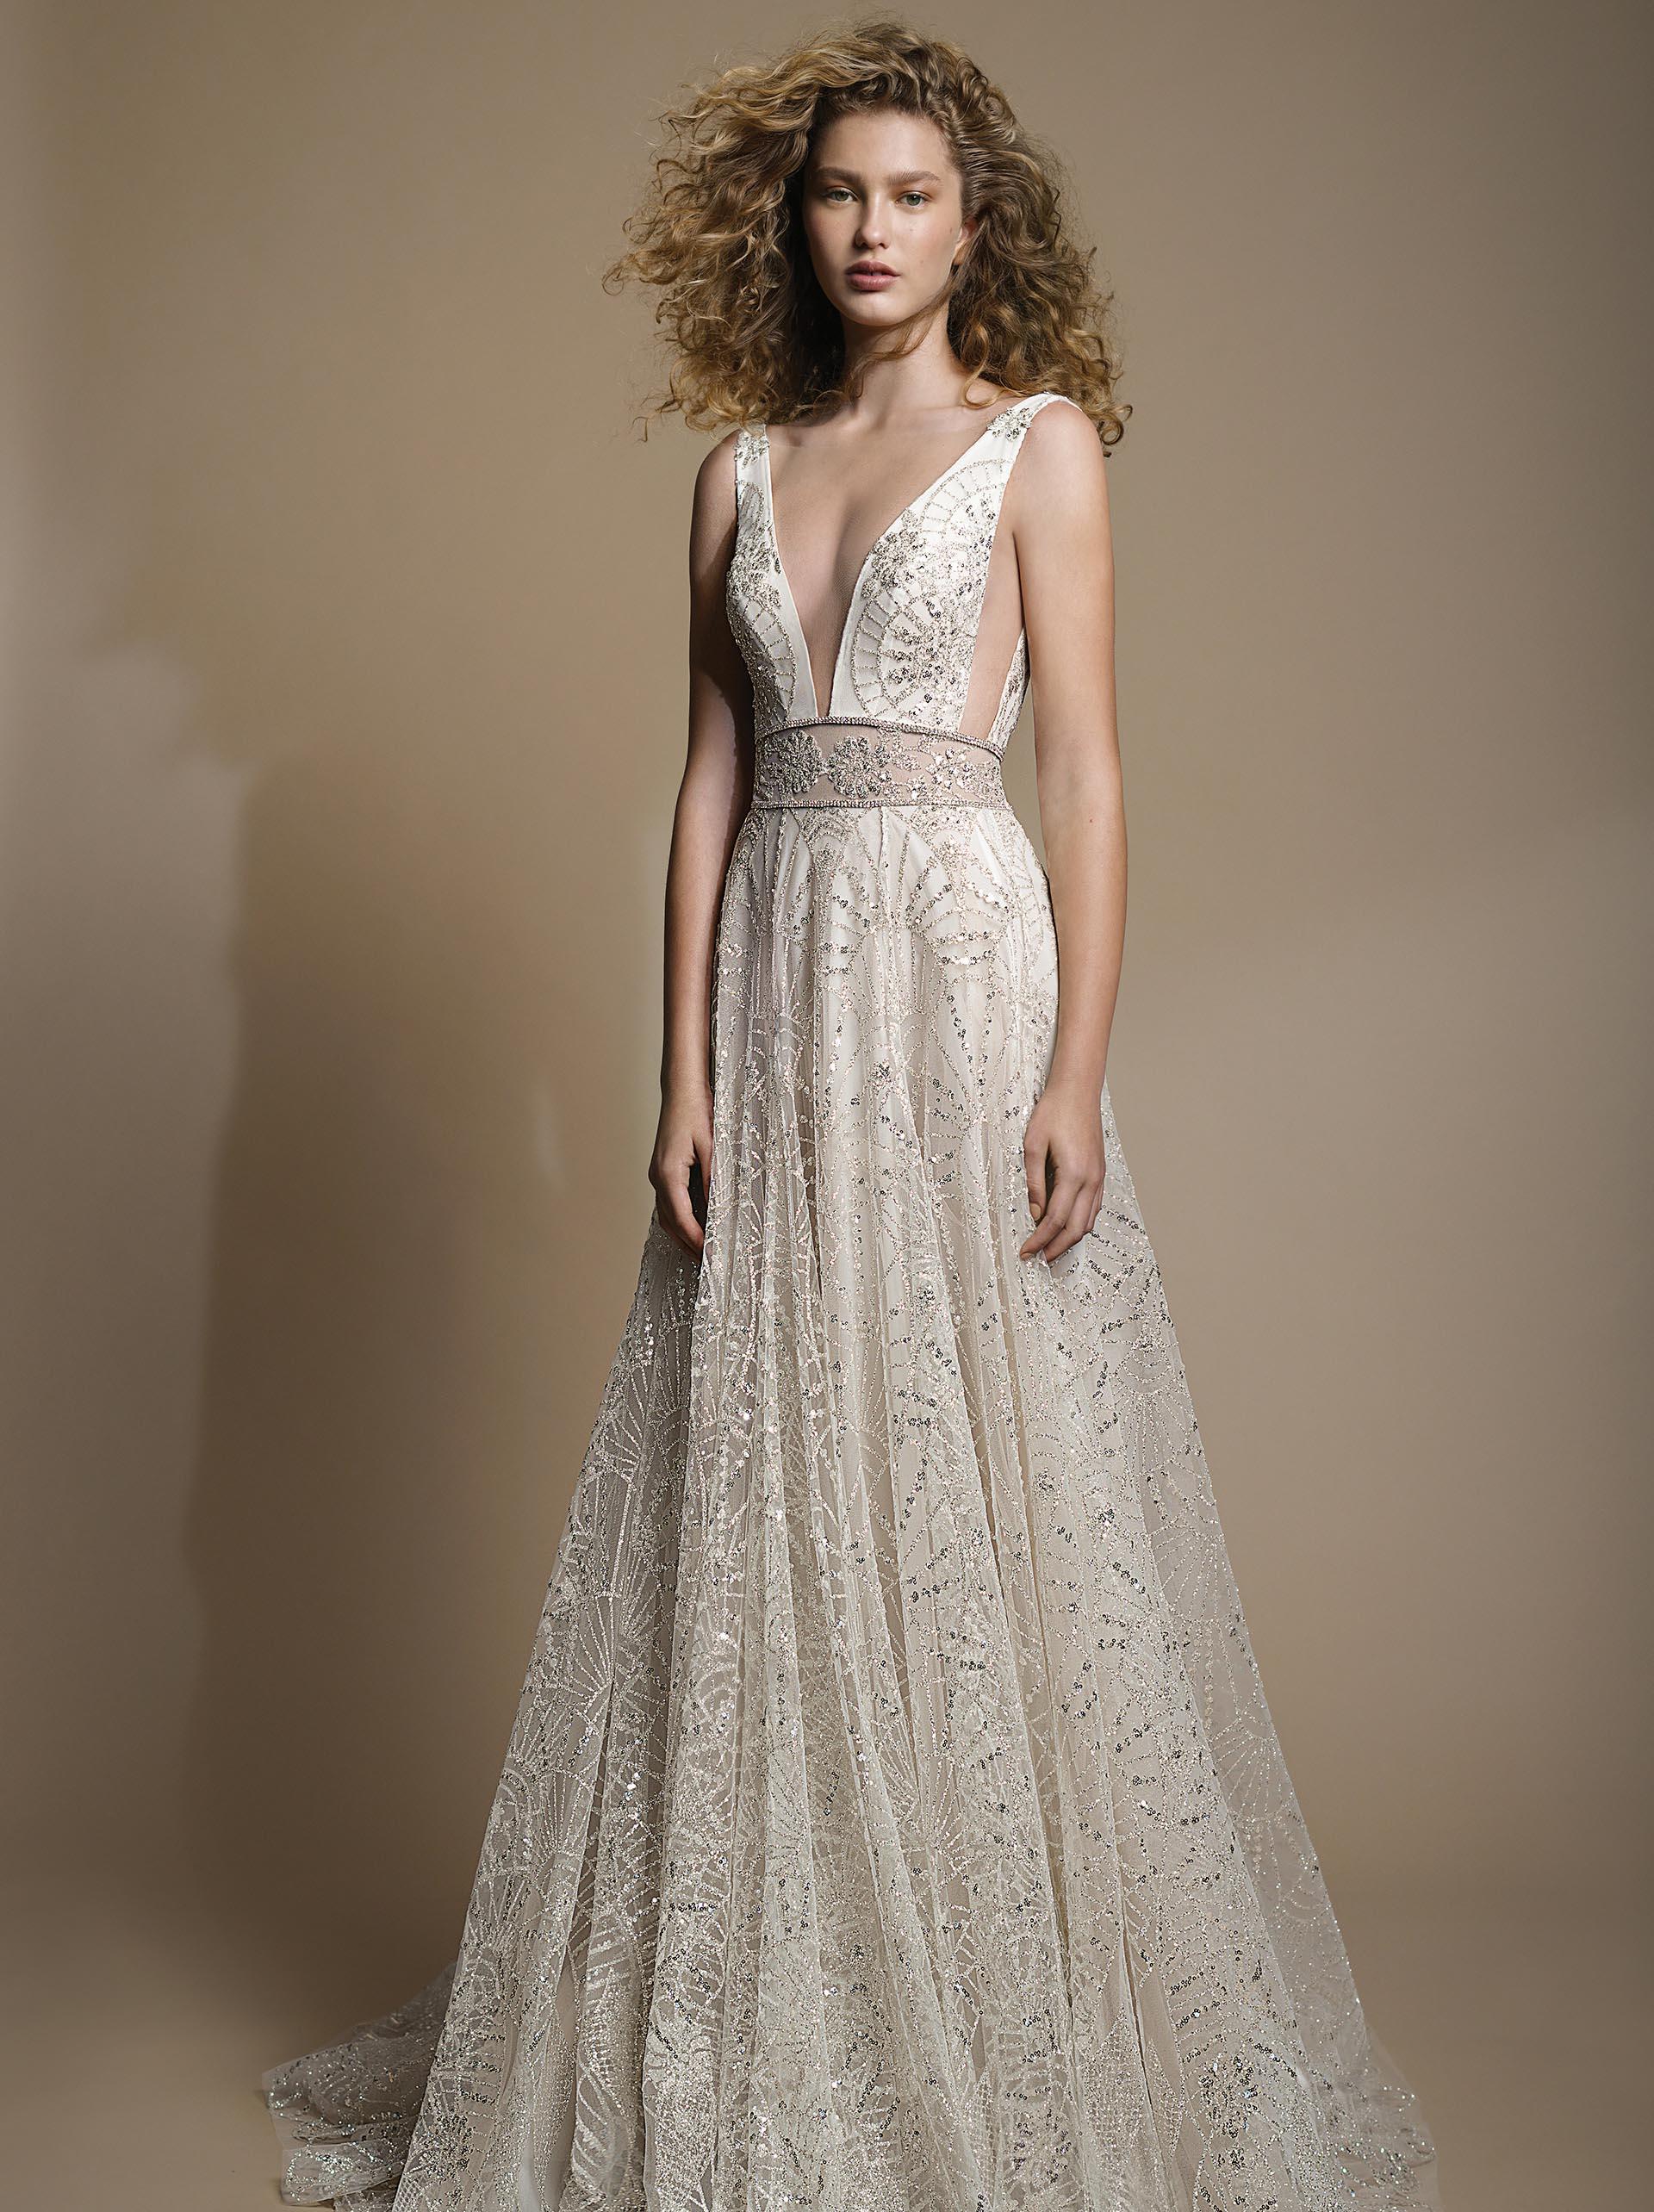 GALA G - 102 Galia Lahav Beaded V- neck A-line wedding dress Tampa bridal shop